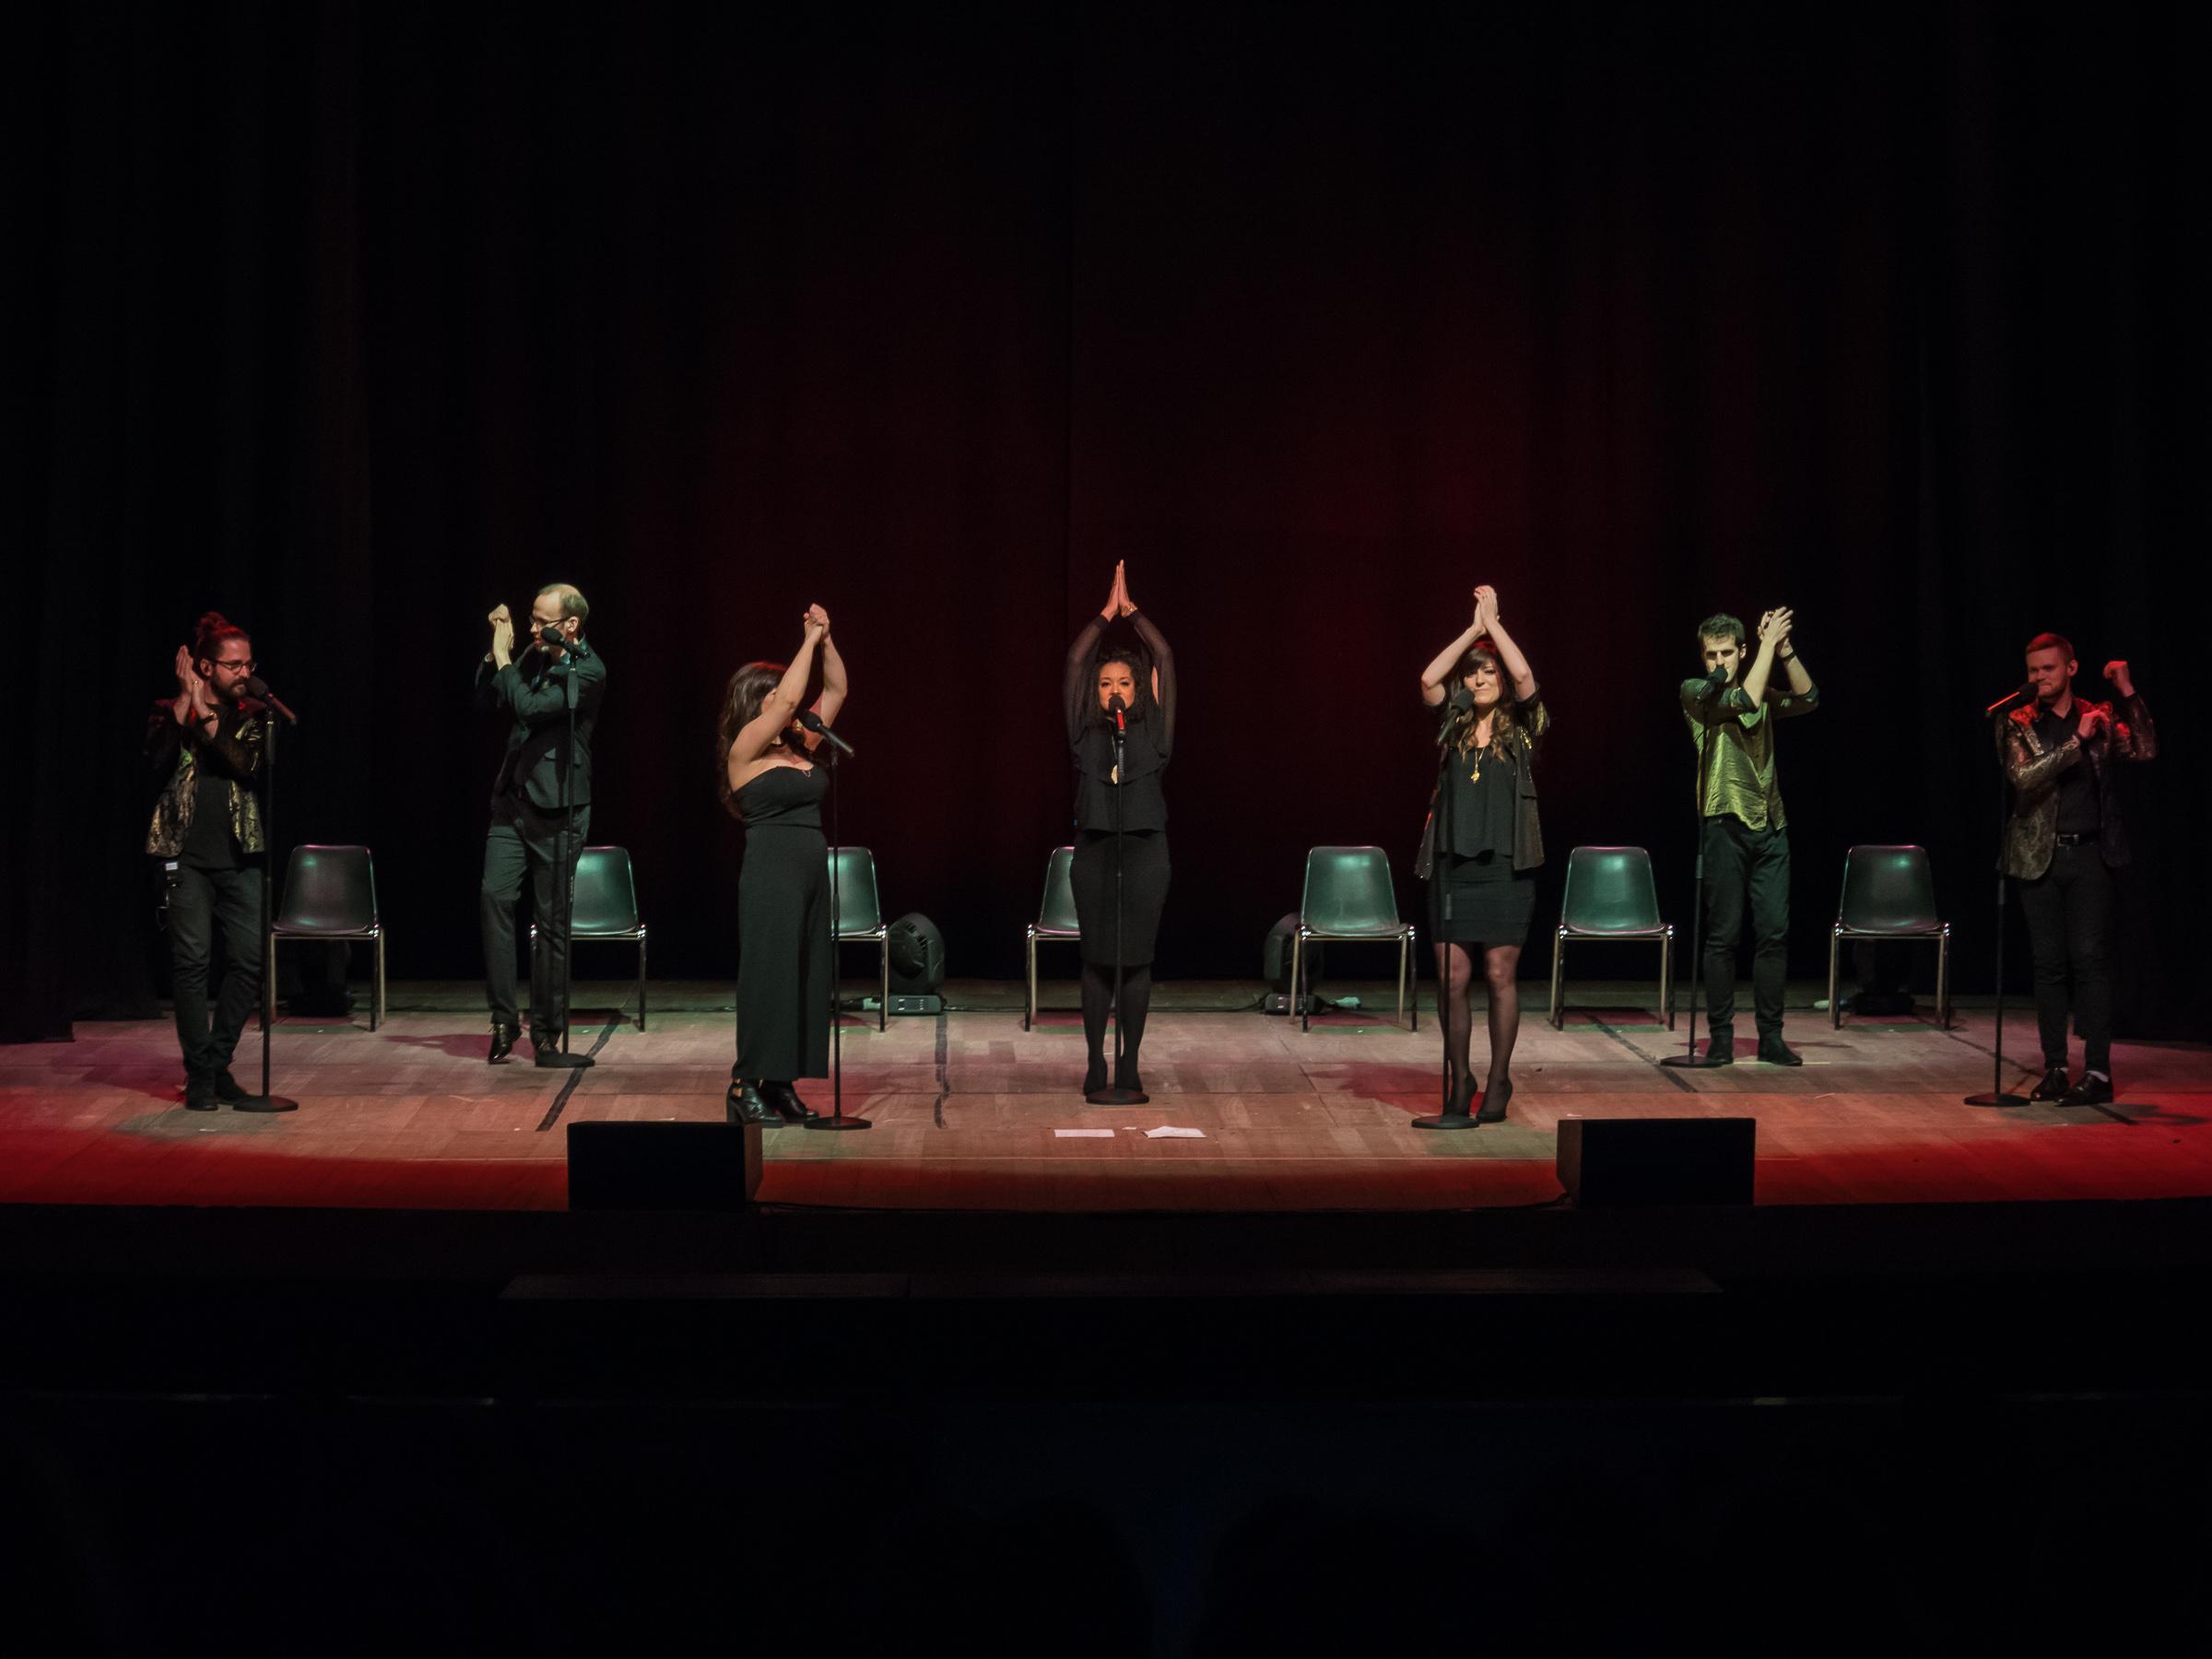 10 febbraio: THE SWINGLE SINGERS